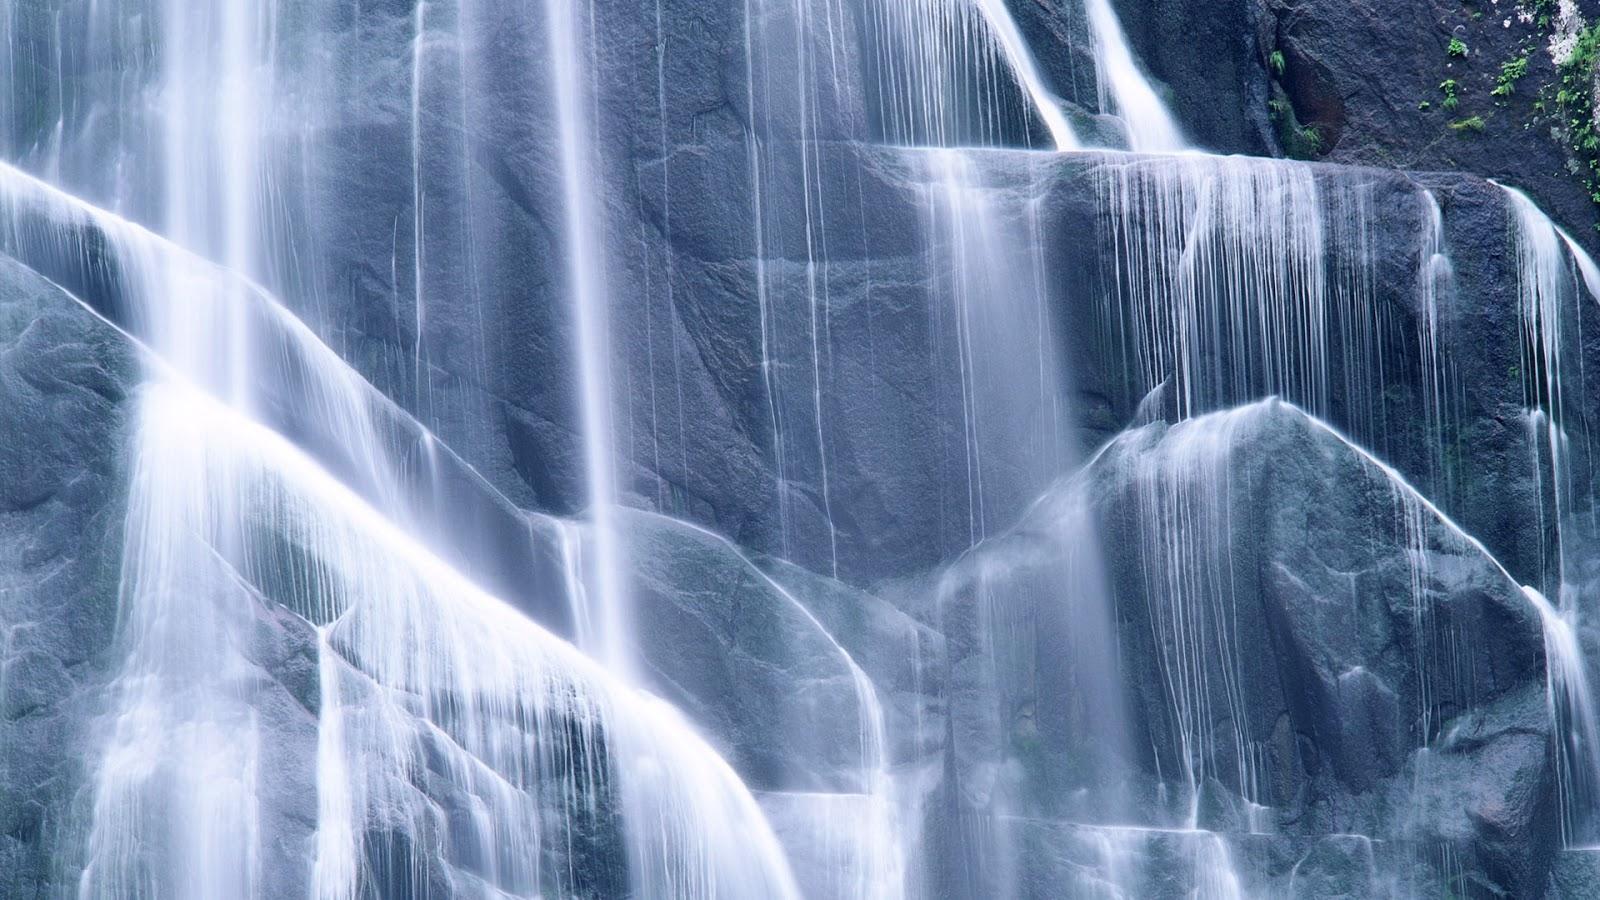 Imágenes Hilandy: Fondo de pantalla Naturaleza cascada deagua ...